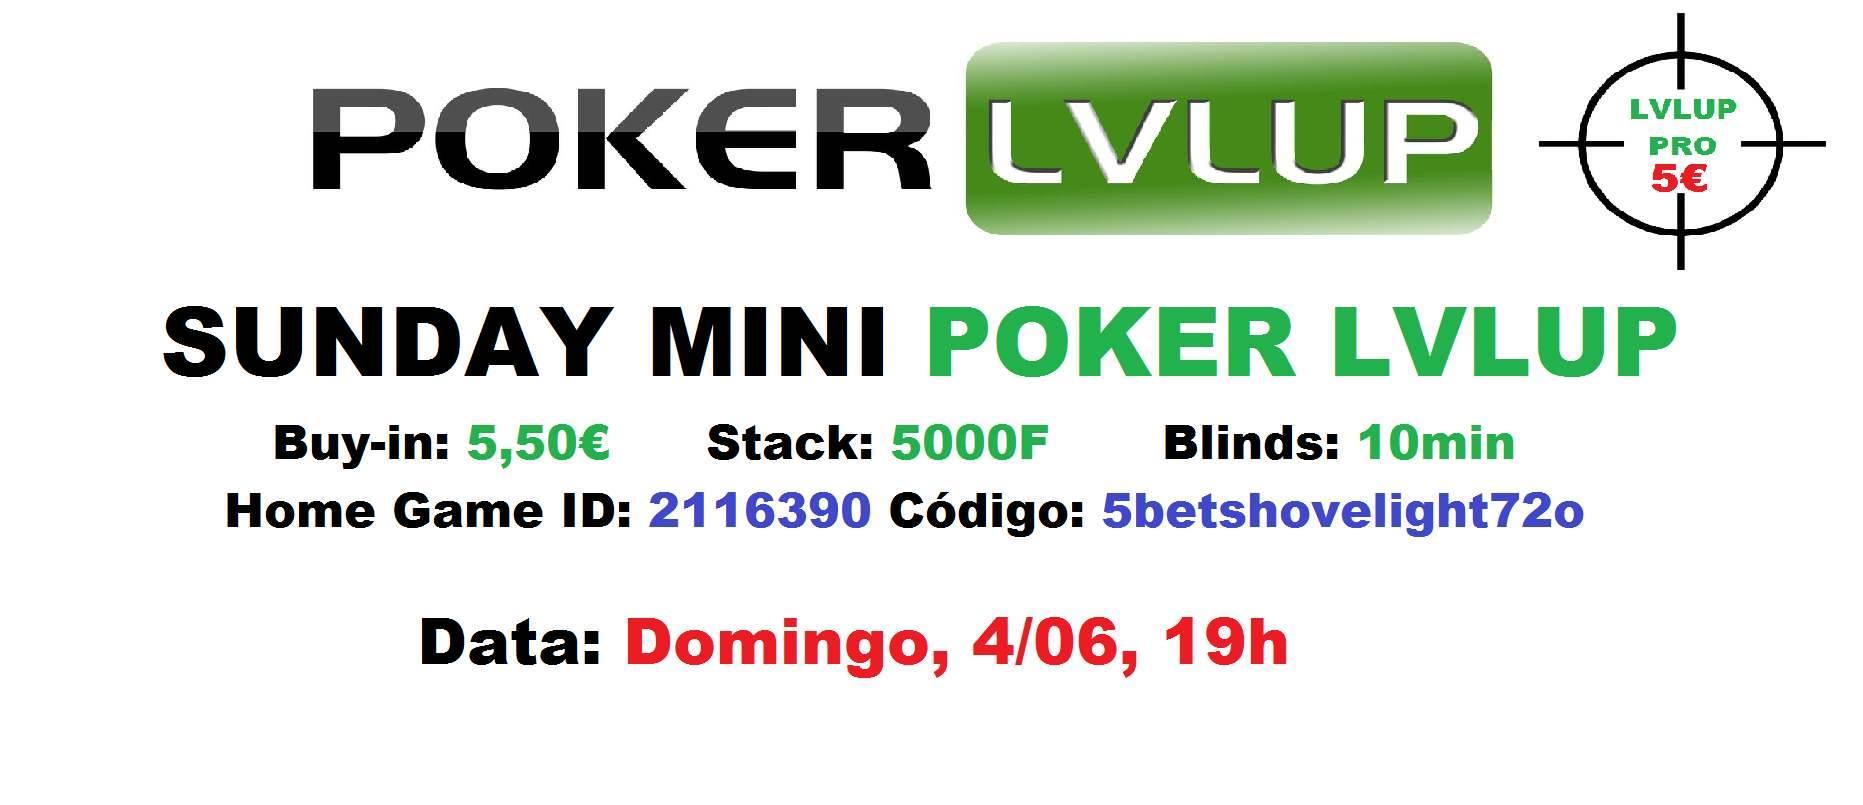 Sunday Mini Poker LVLUP a 4 de Junho 101